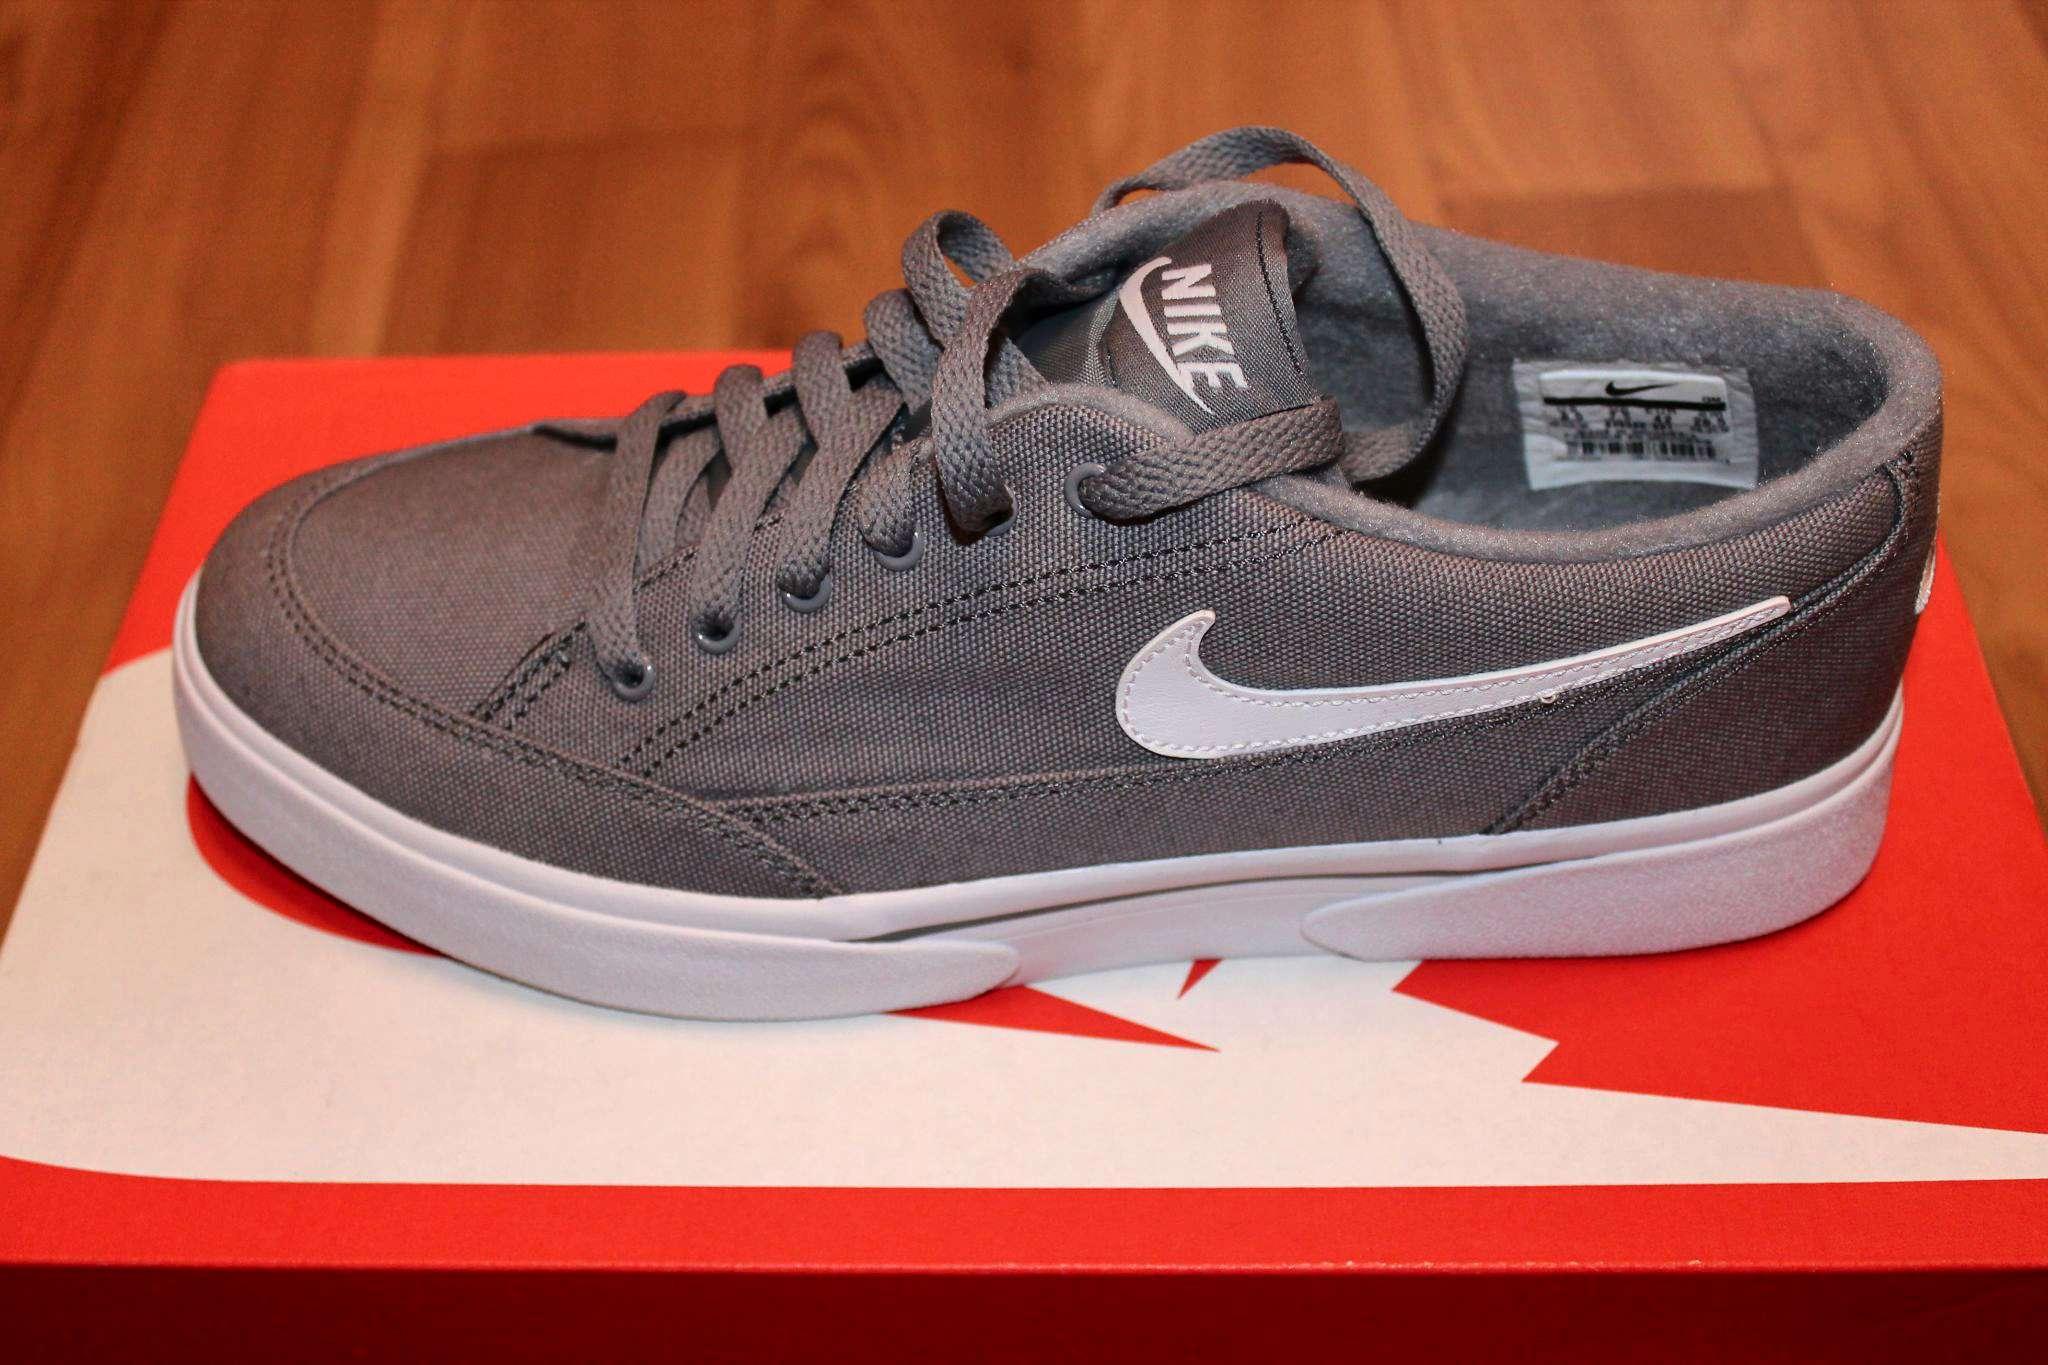 ee588024f39 Men s Textile Gts Nike 16 Shoe q8RxB